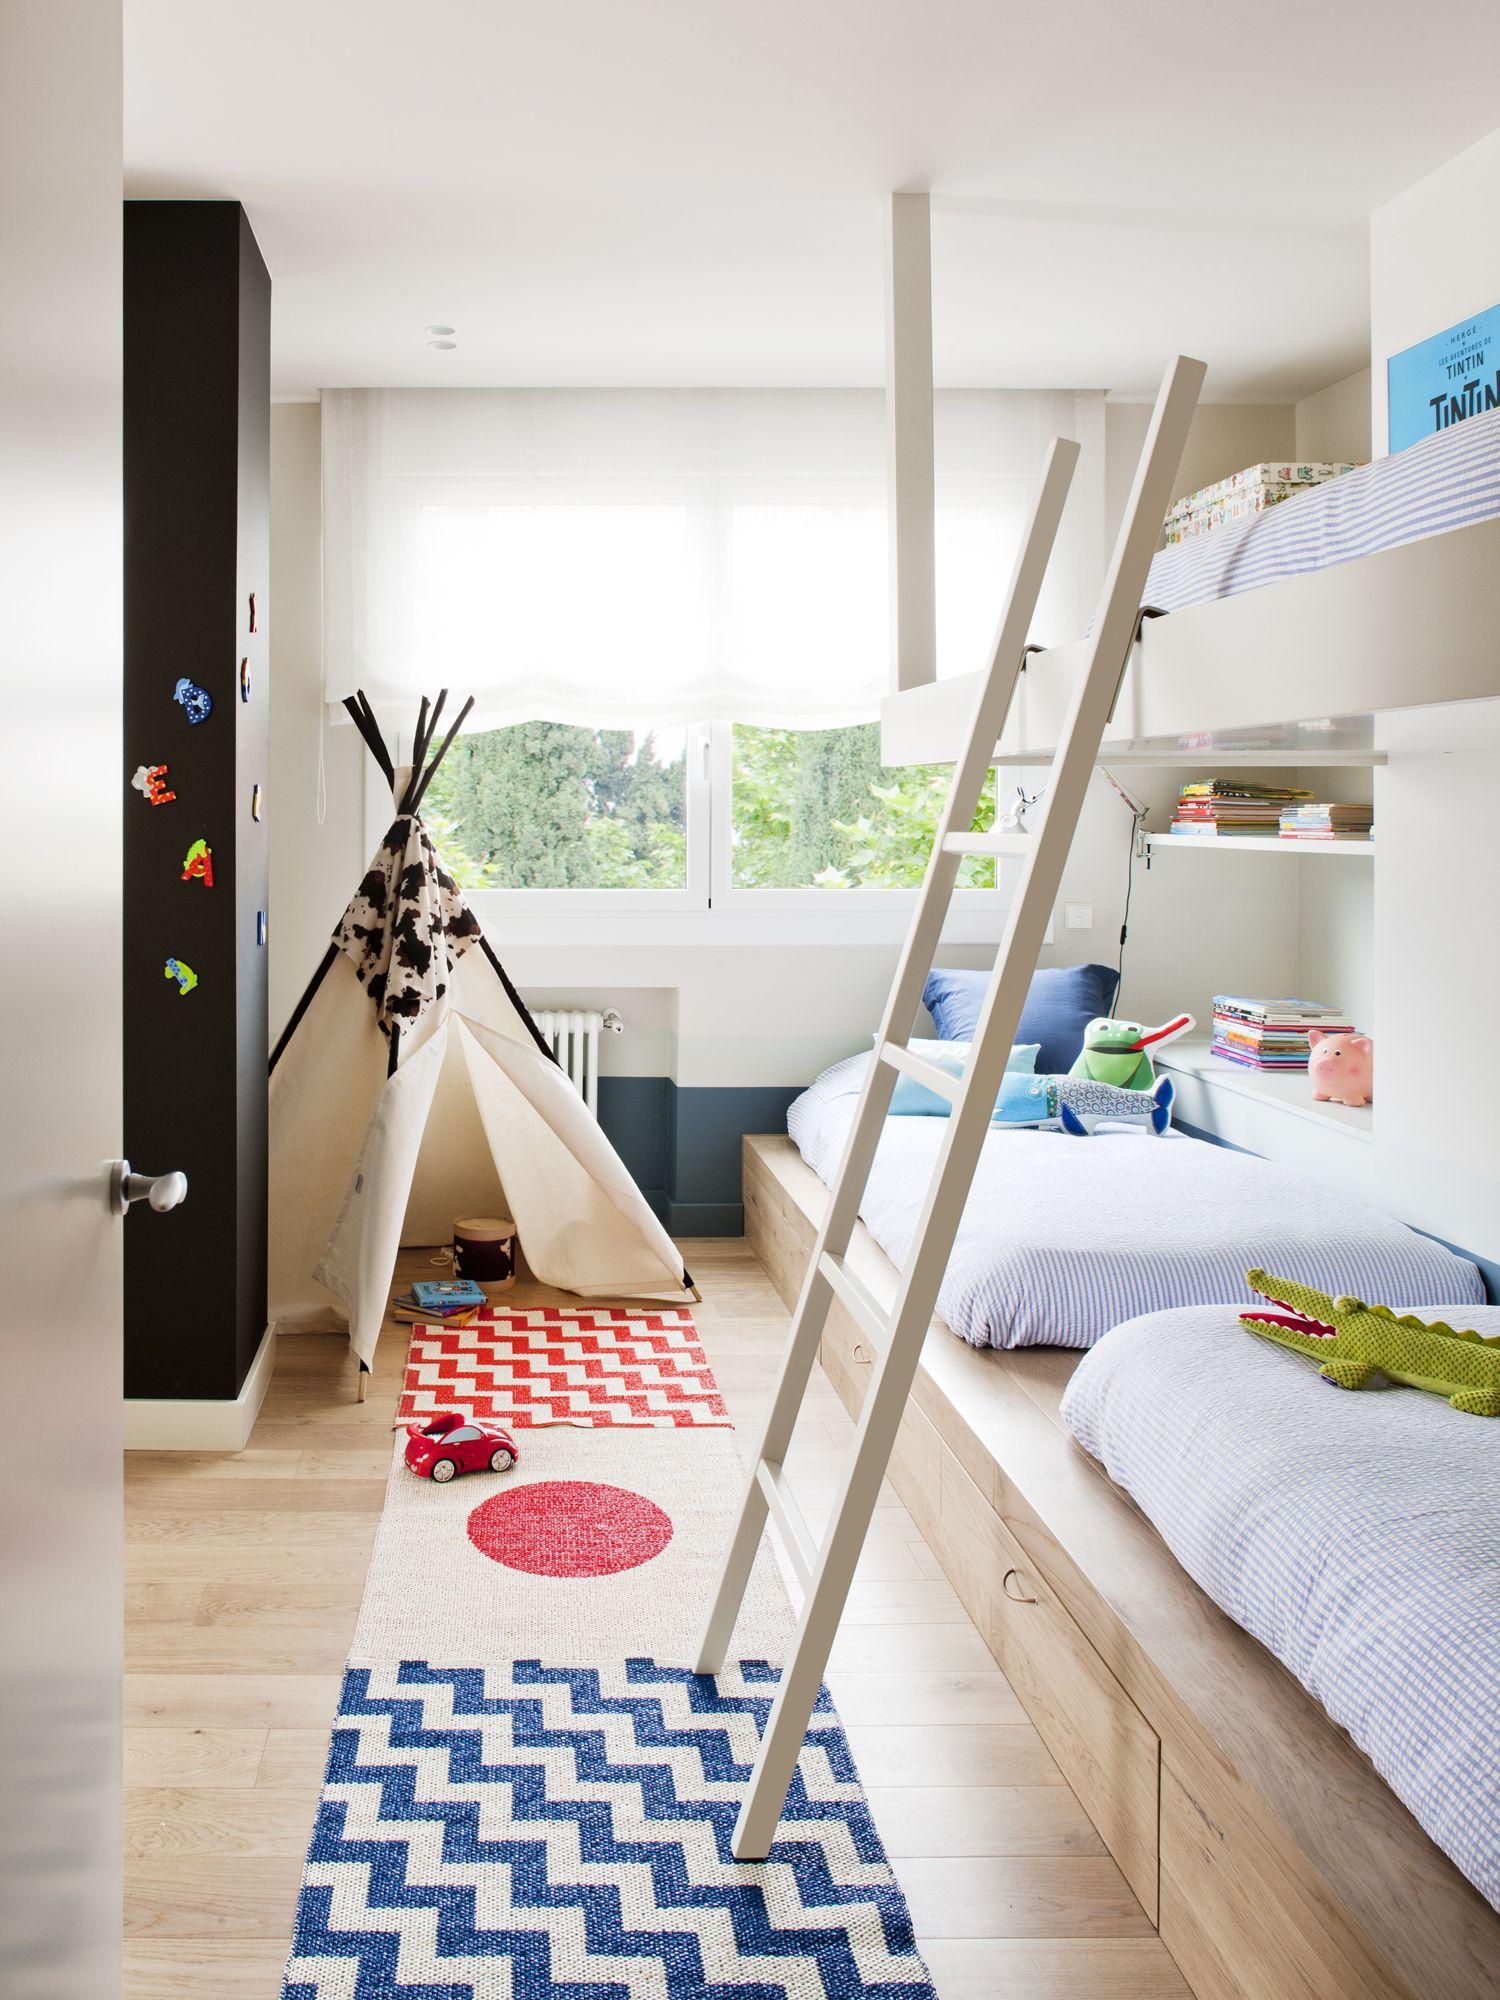 Built in loft bed ideas  Shared room with built in bunk beds  Ideas para mi futura casa D